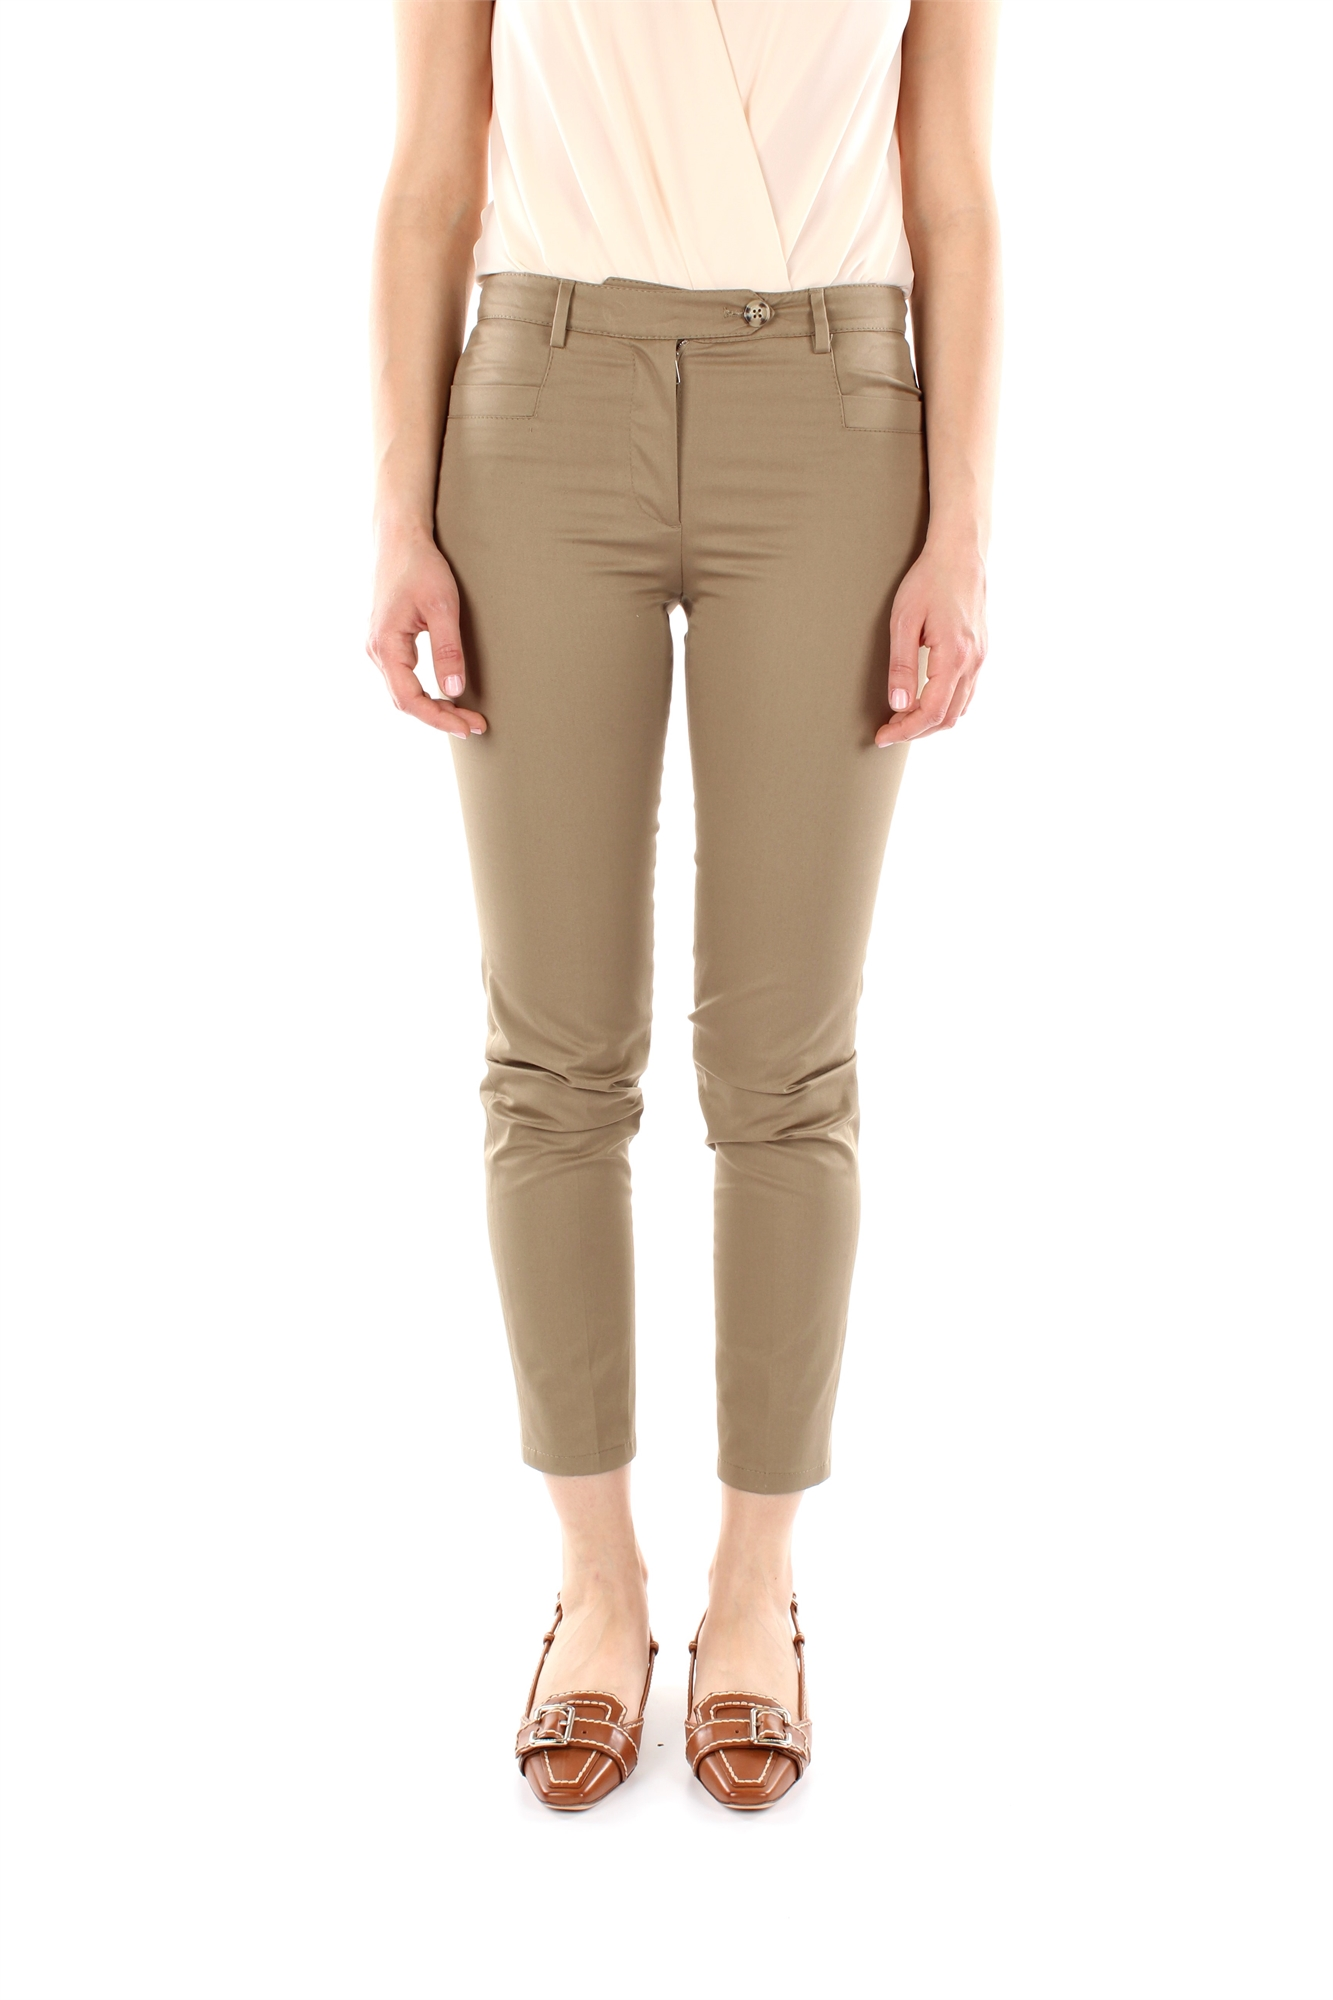 Lastest 27 Wonderful Cotton Pants For Women U2013 Playzoa.com